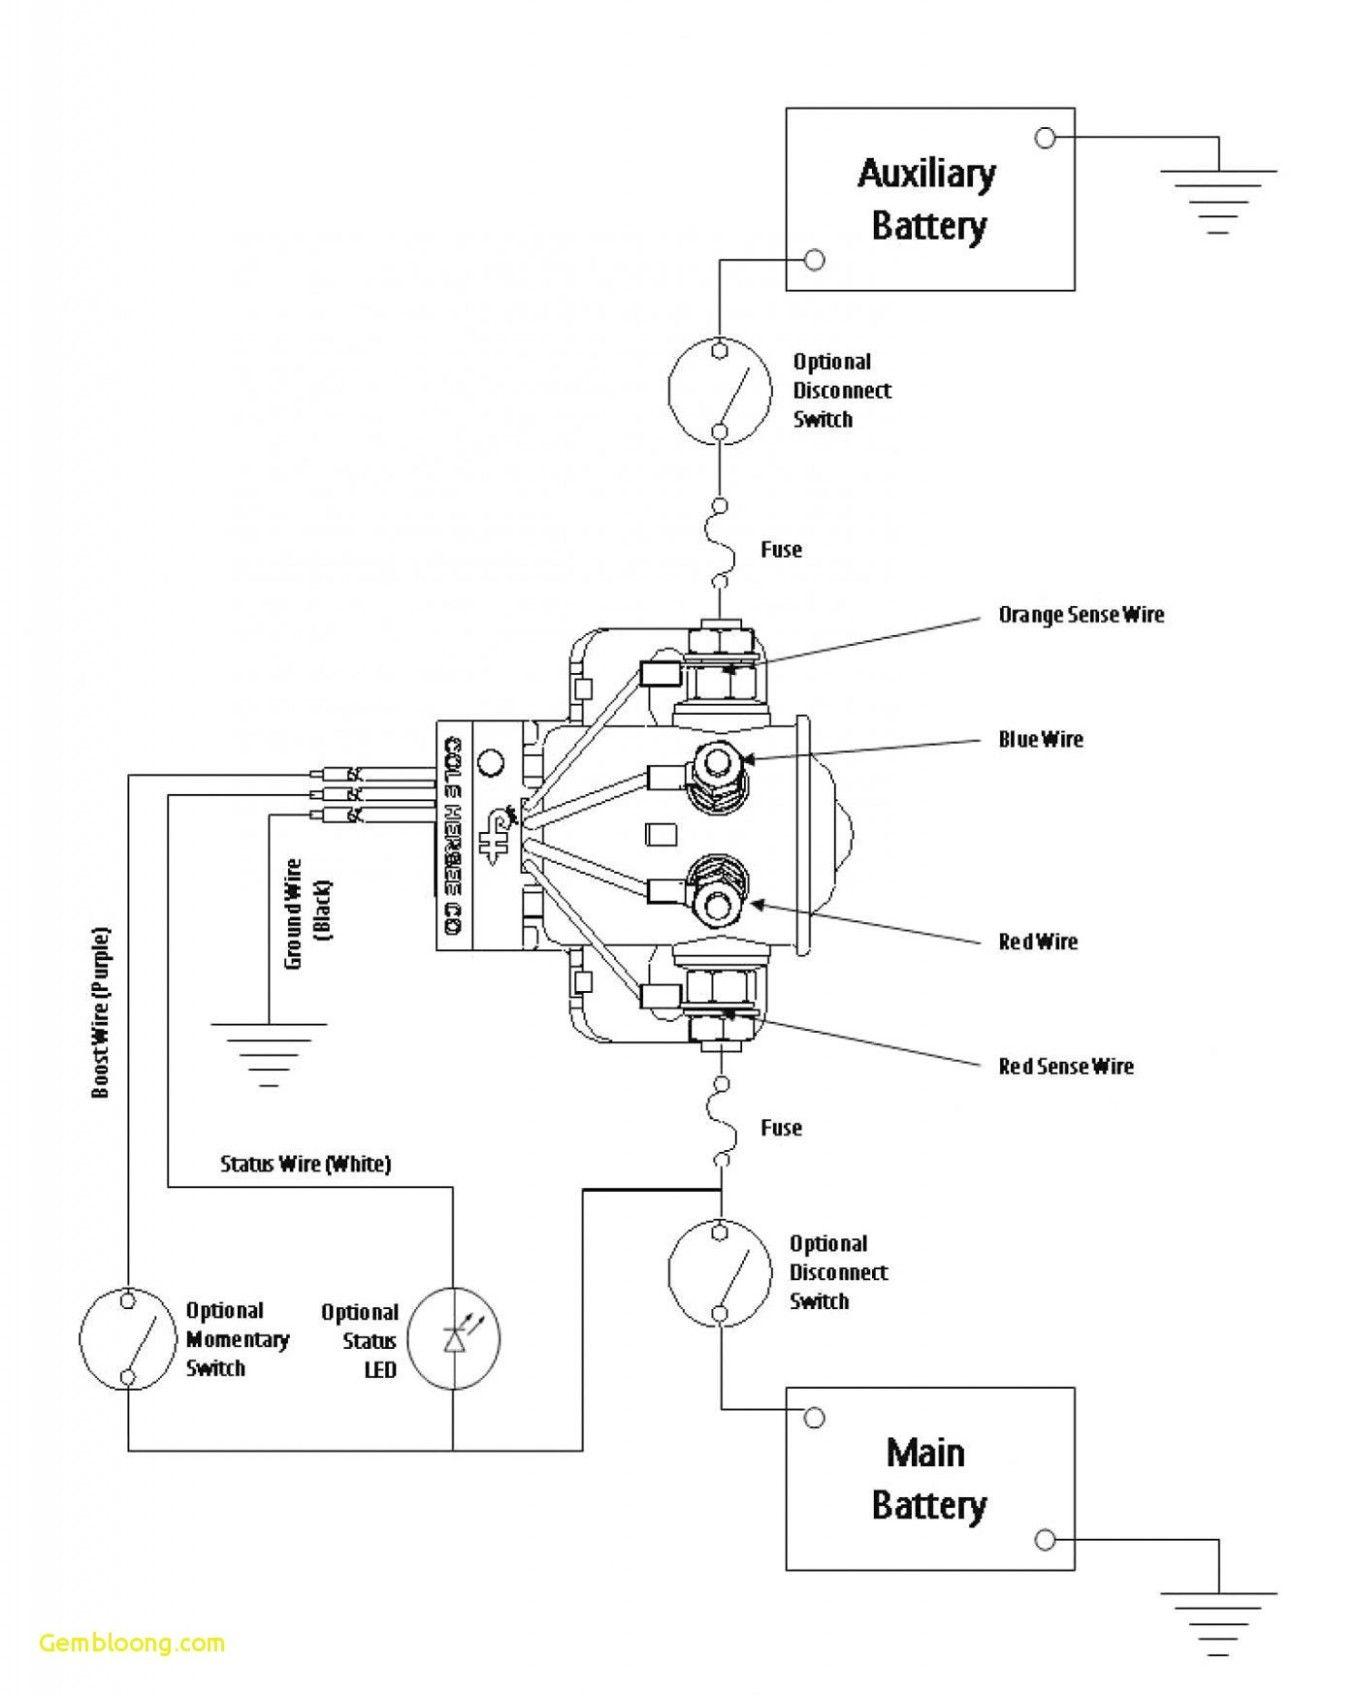 Engine Diagram Bmw M6 Yamaha In 2020 Electrical Wiring Diagram Alternator Car Stereo Systems